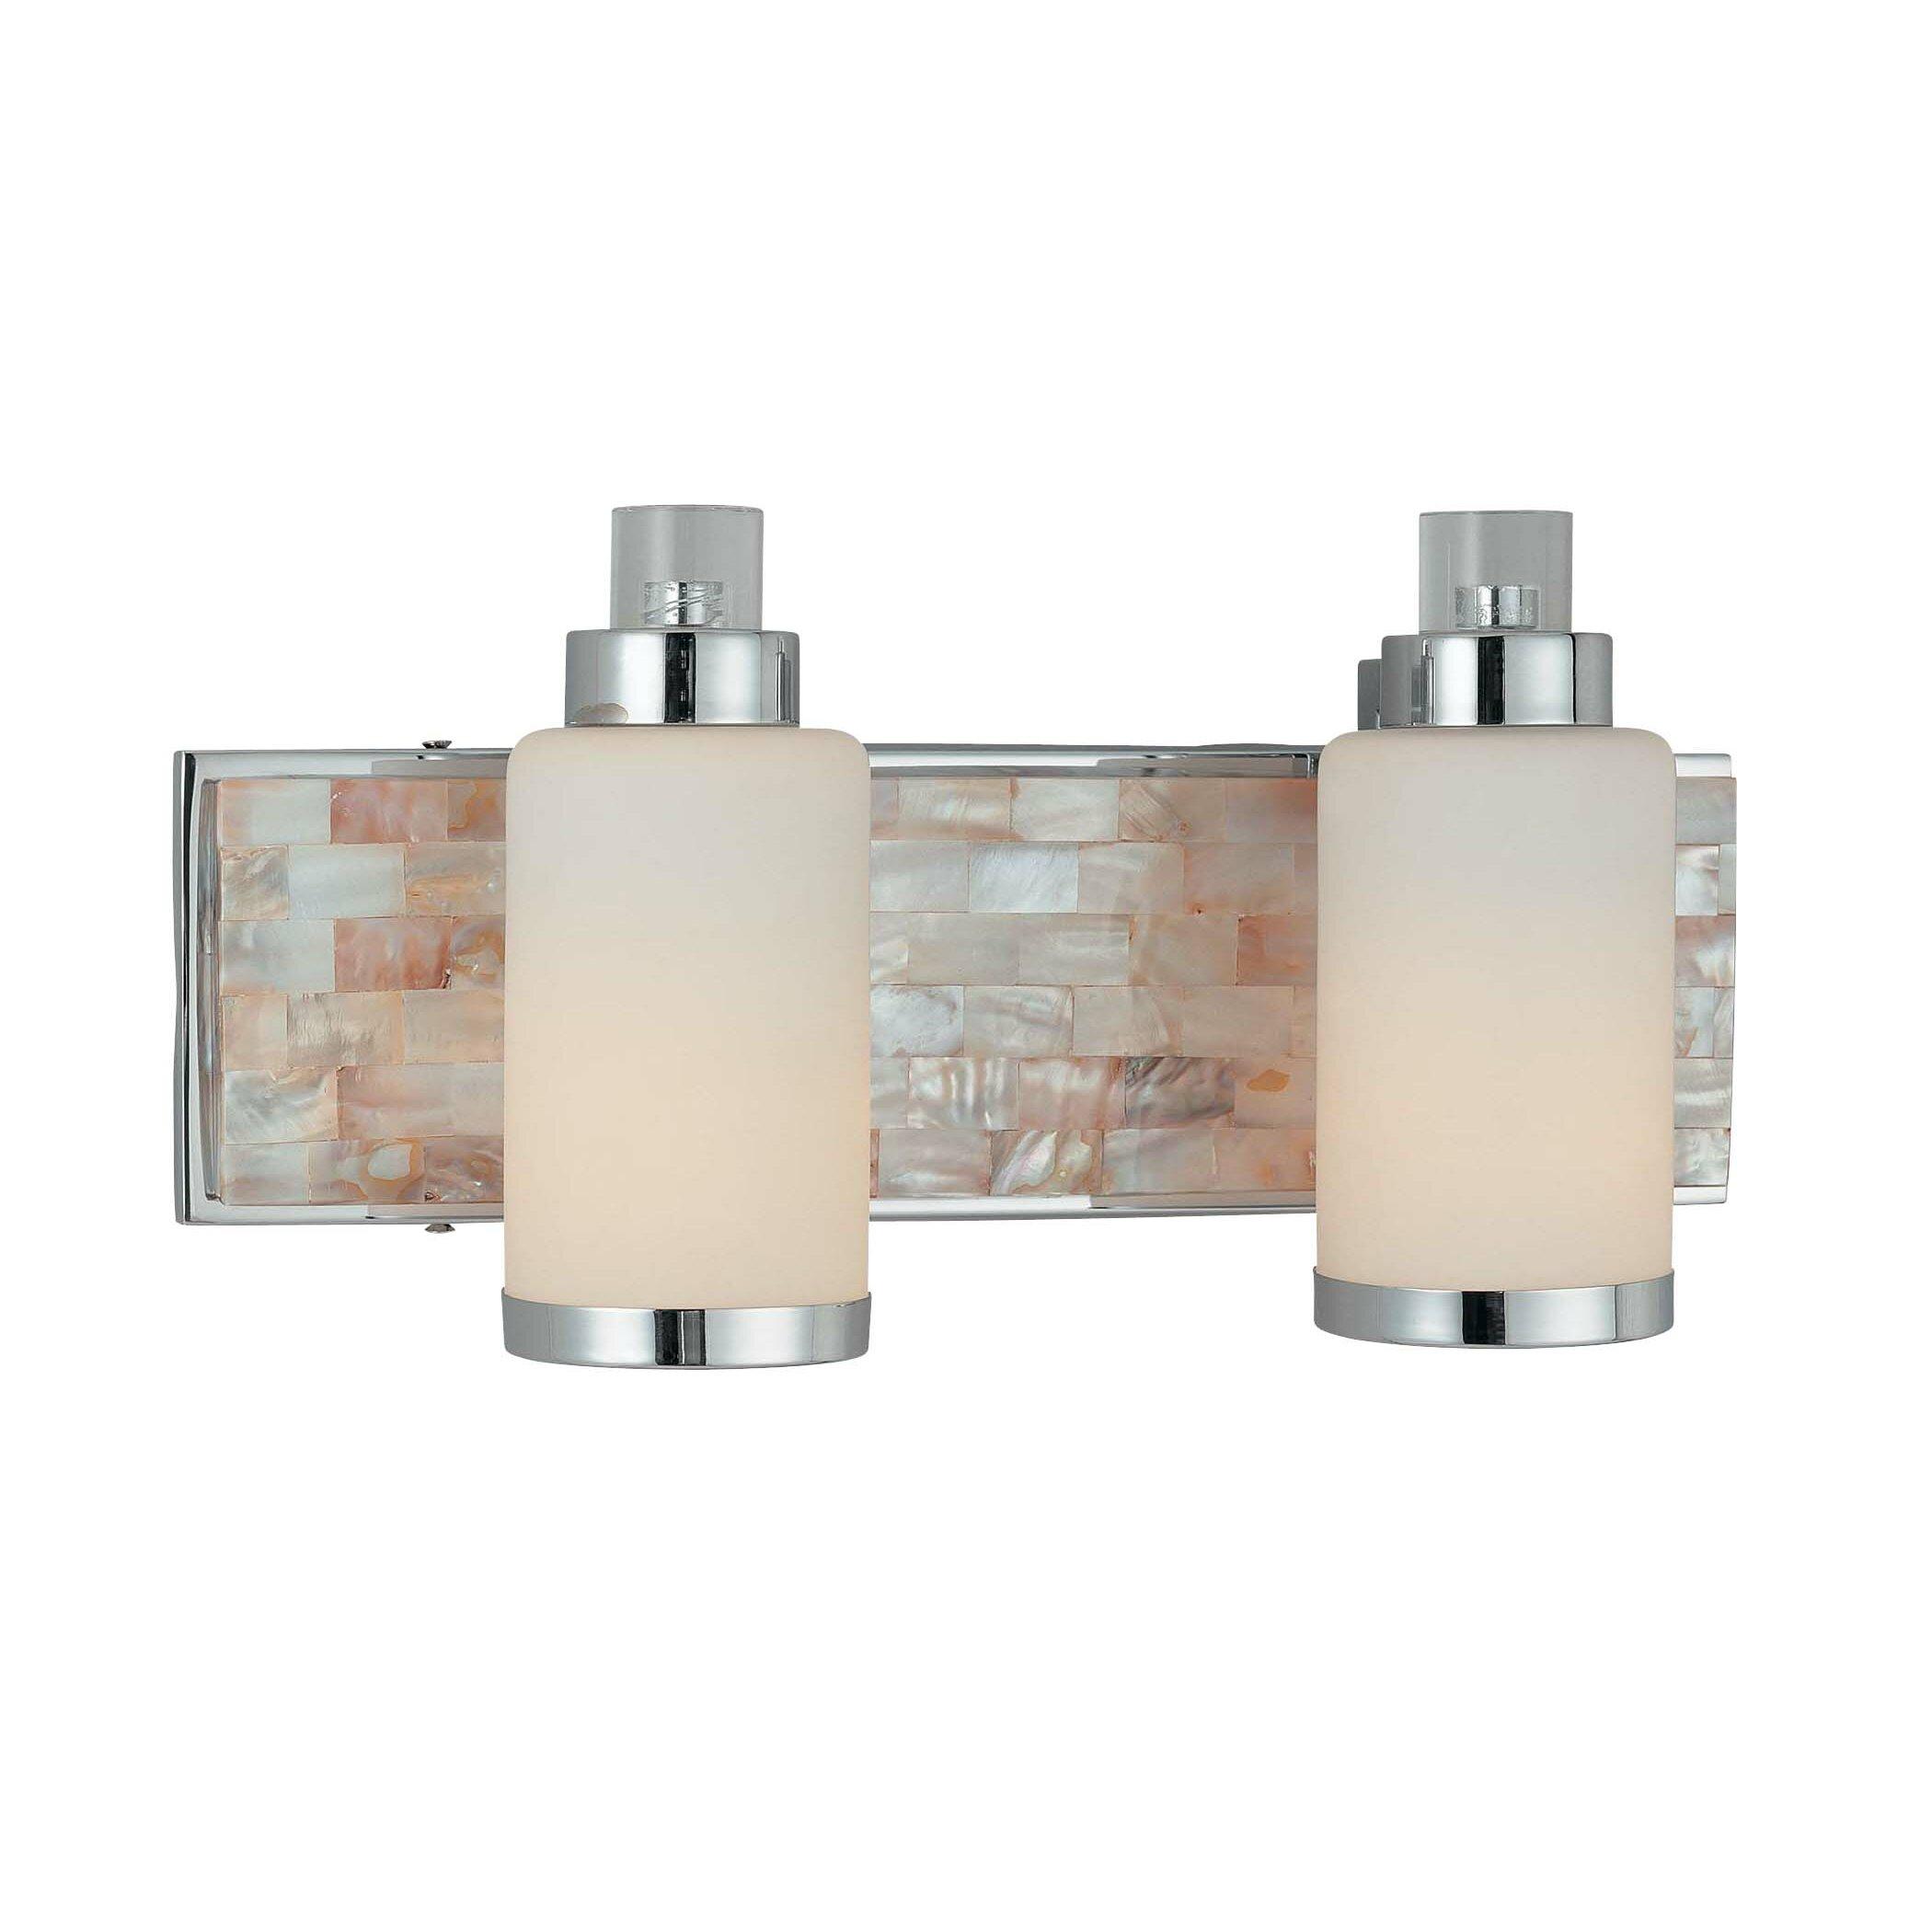 lighting wall lights bathroom vanity lighting minka lavery sku. Black Bedroom Furniture Sets. Home Design Ideas